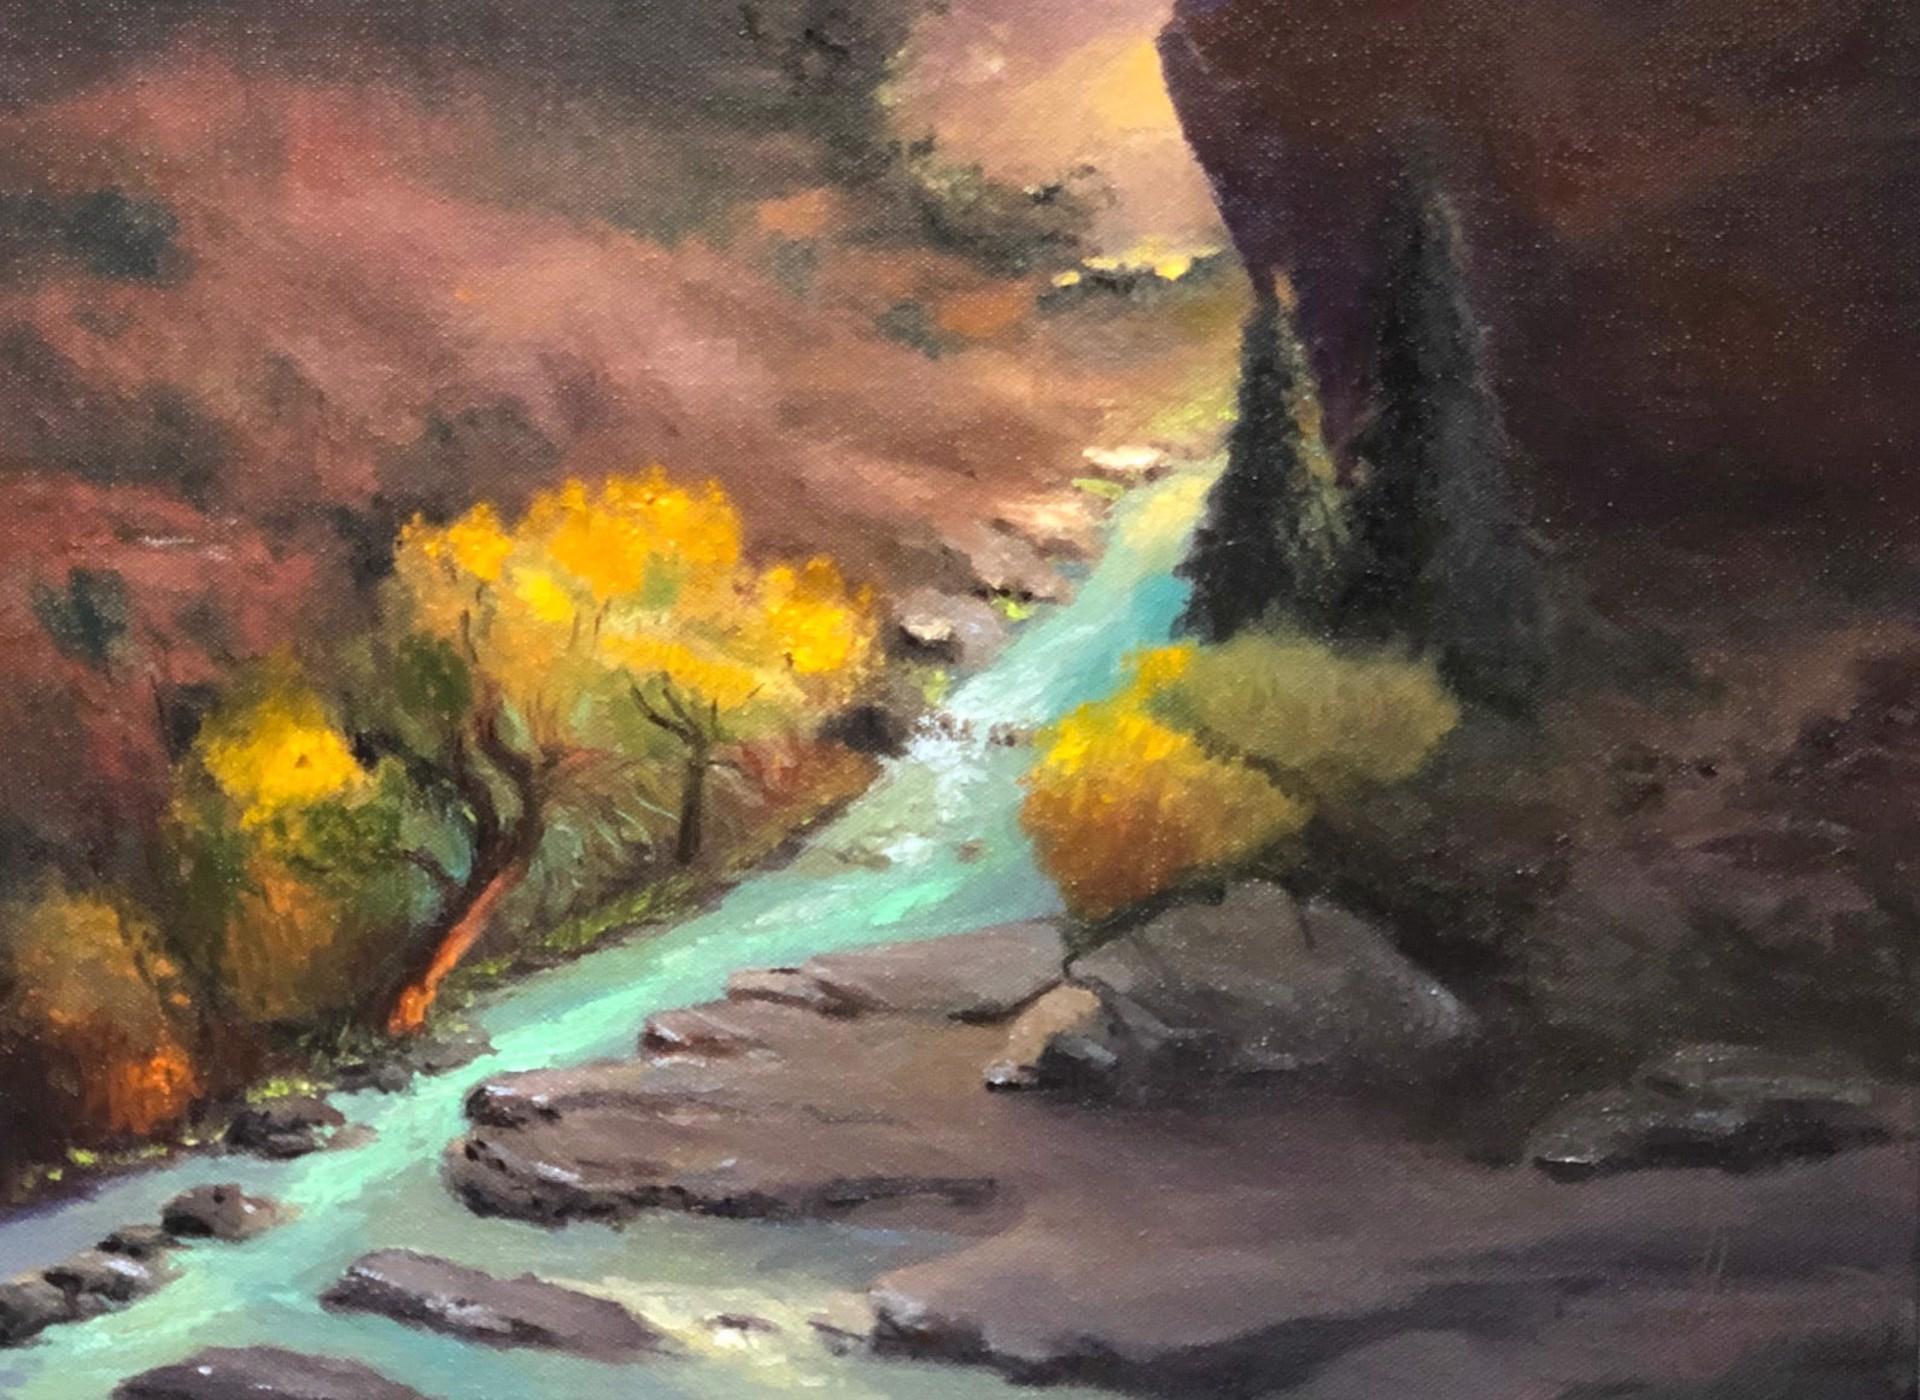 Flowing River by Craig Freeman